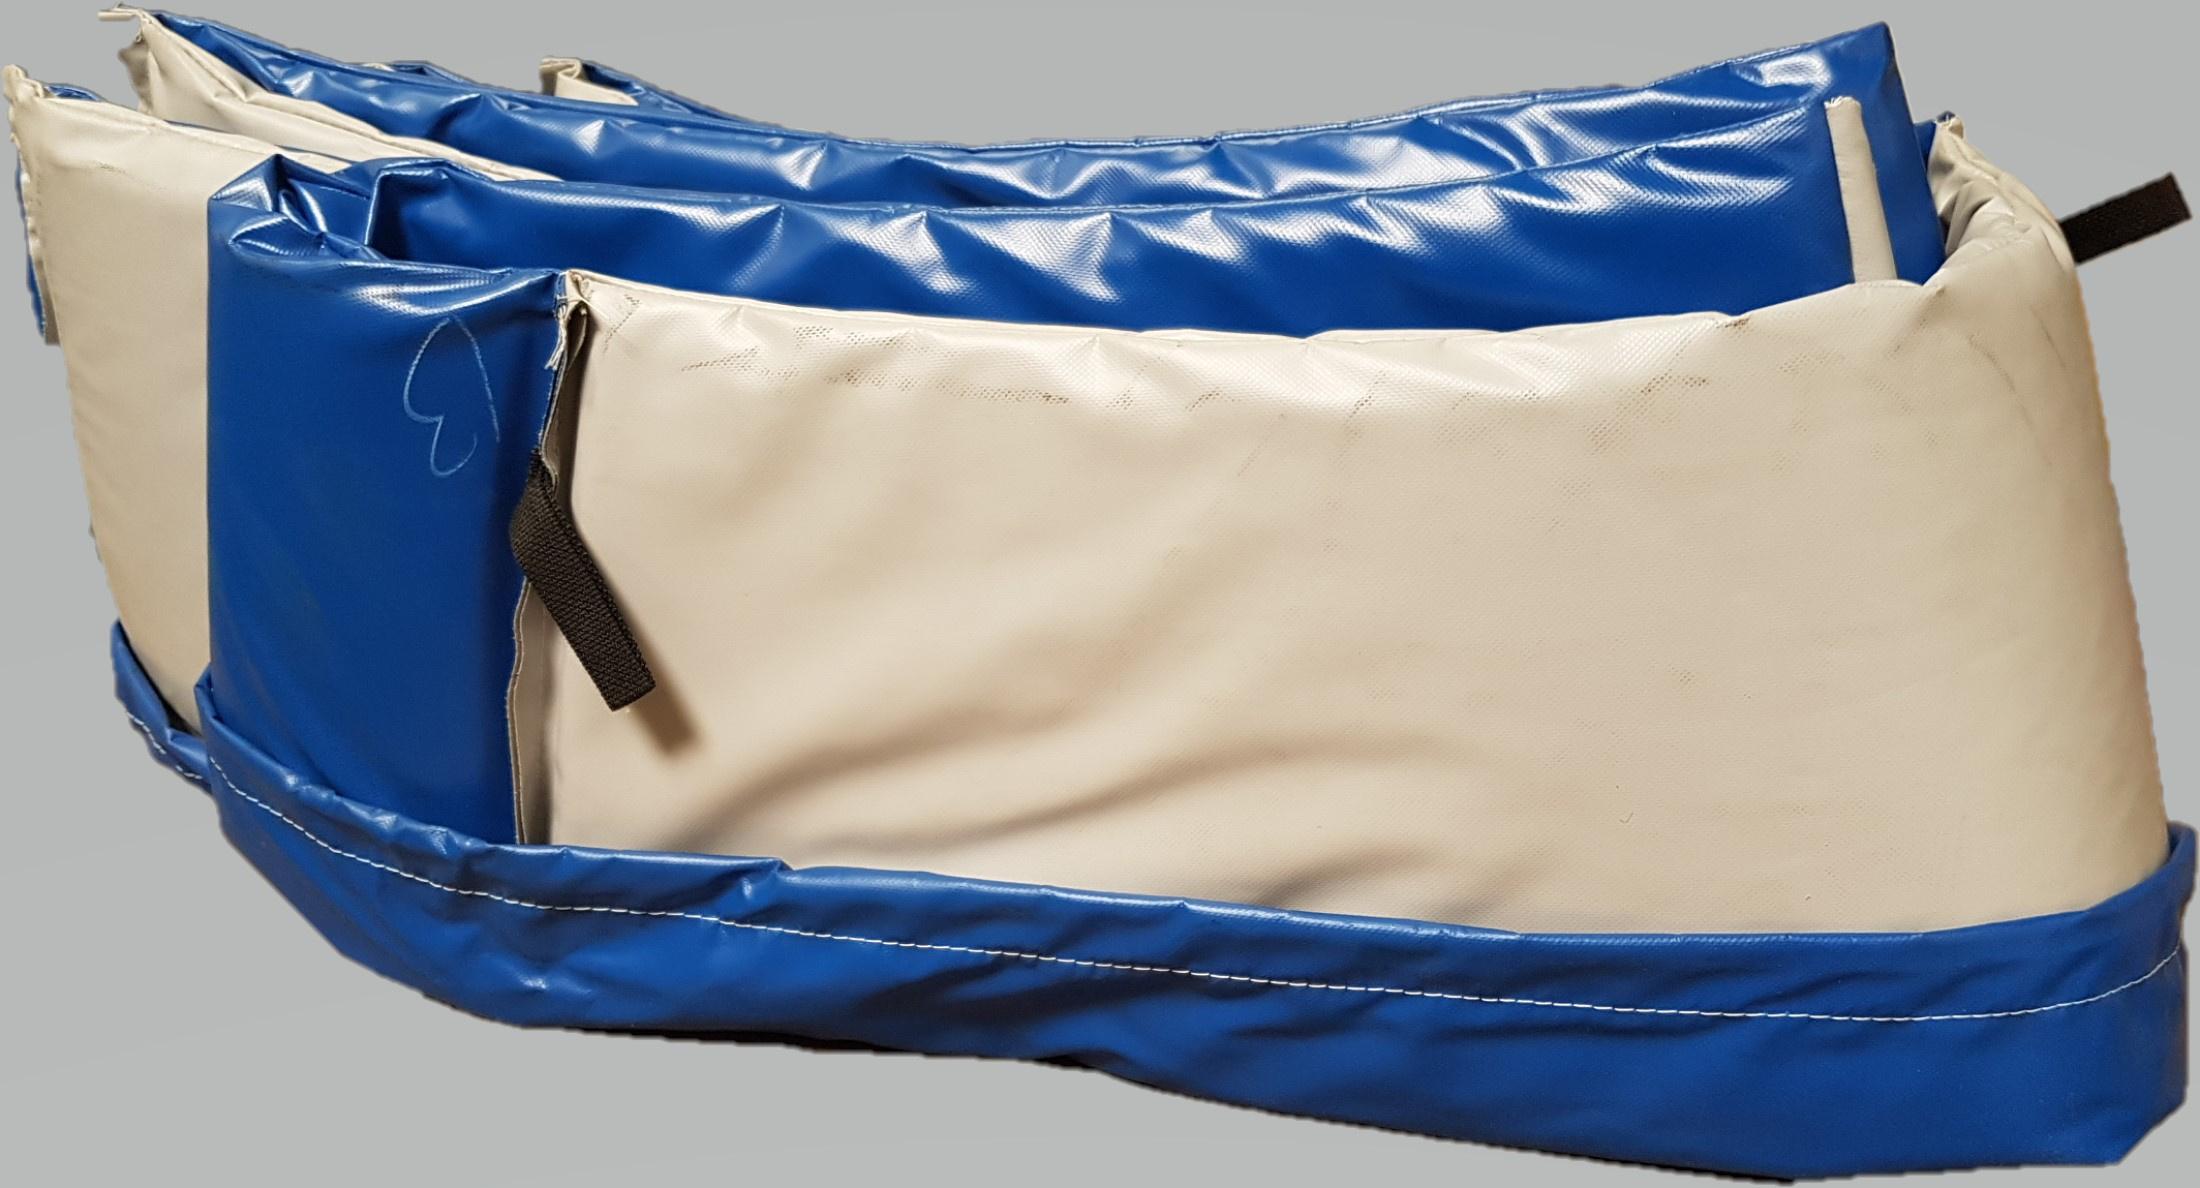 Trampoline Safety Pad